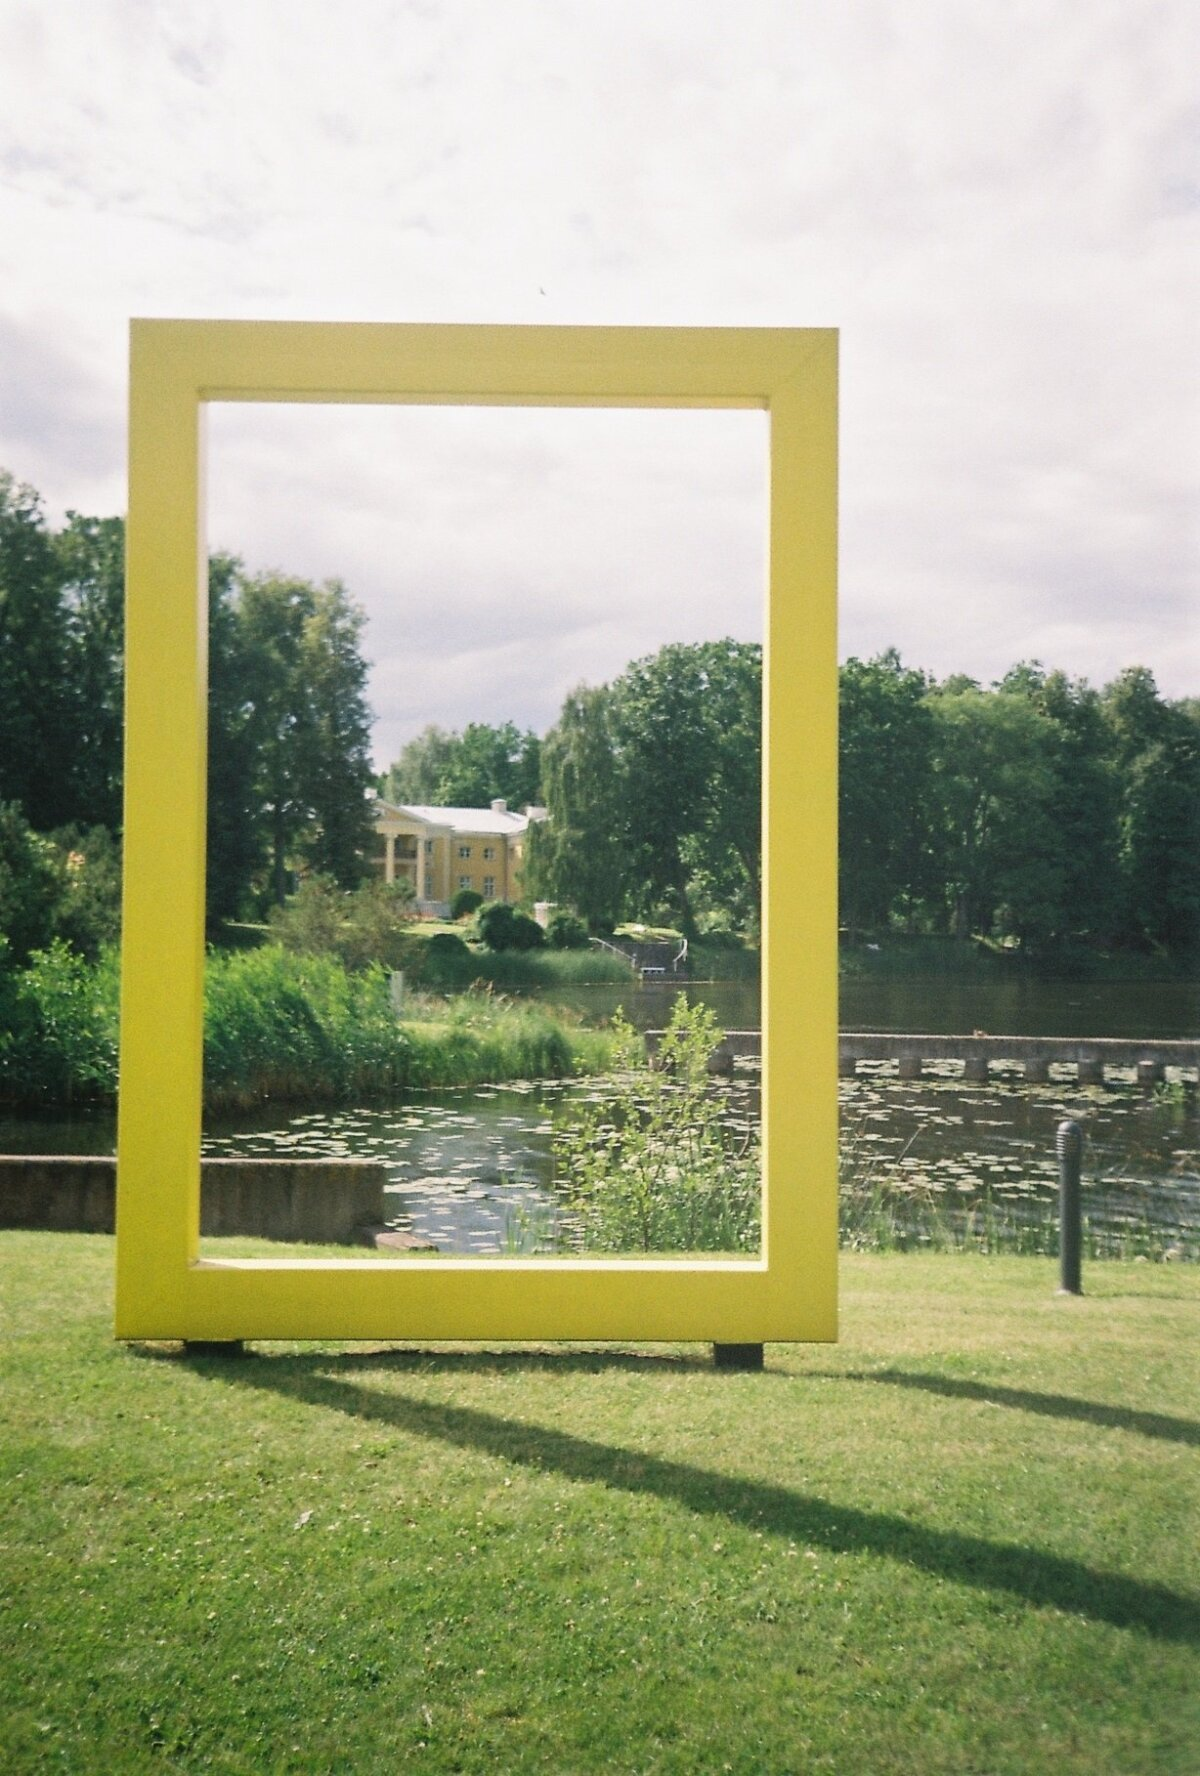 Желтая рамка - символ National Geographic. А сзади мыза Ряпина